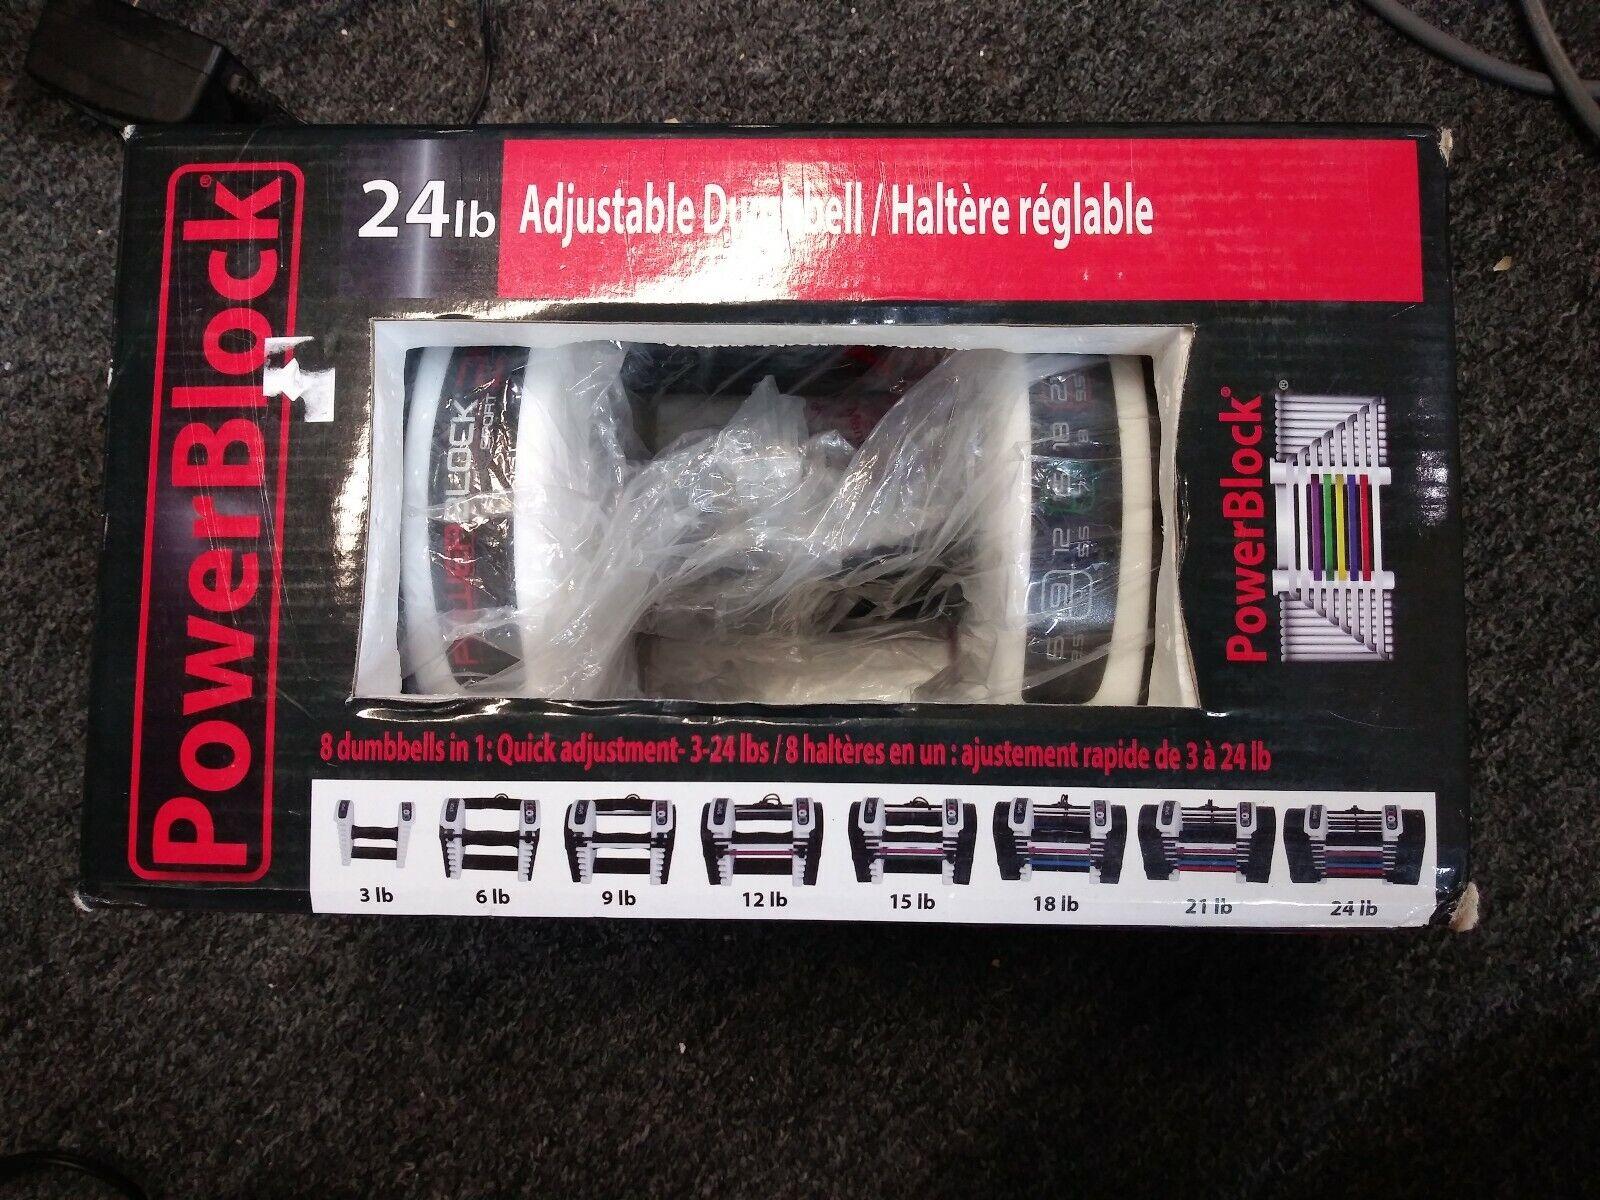 Powerblock 24lb Sport 24 Adjustable Dumbbell Set Of 2 For Sale Online Ebay